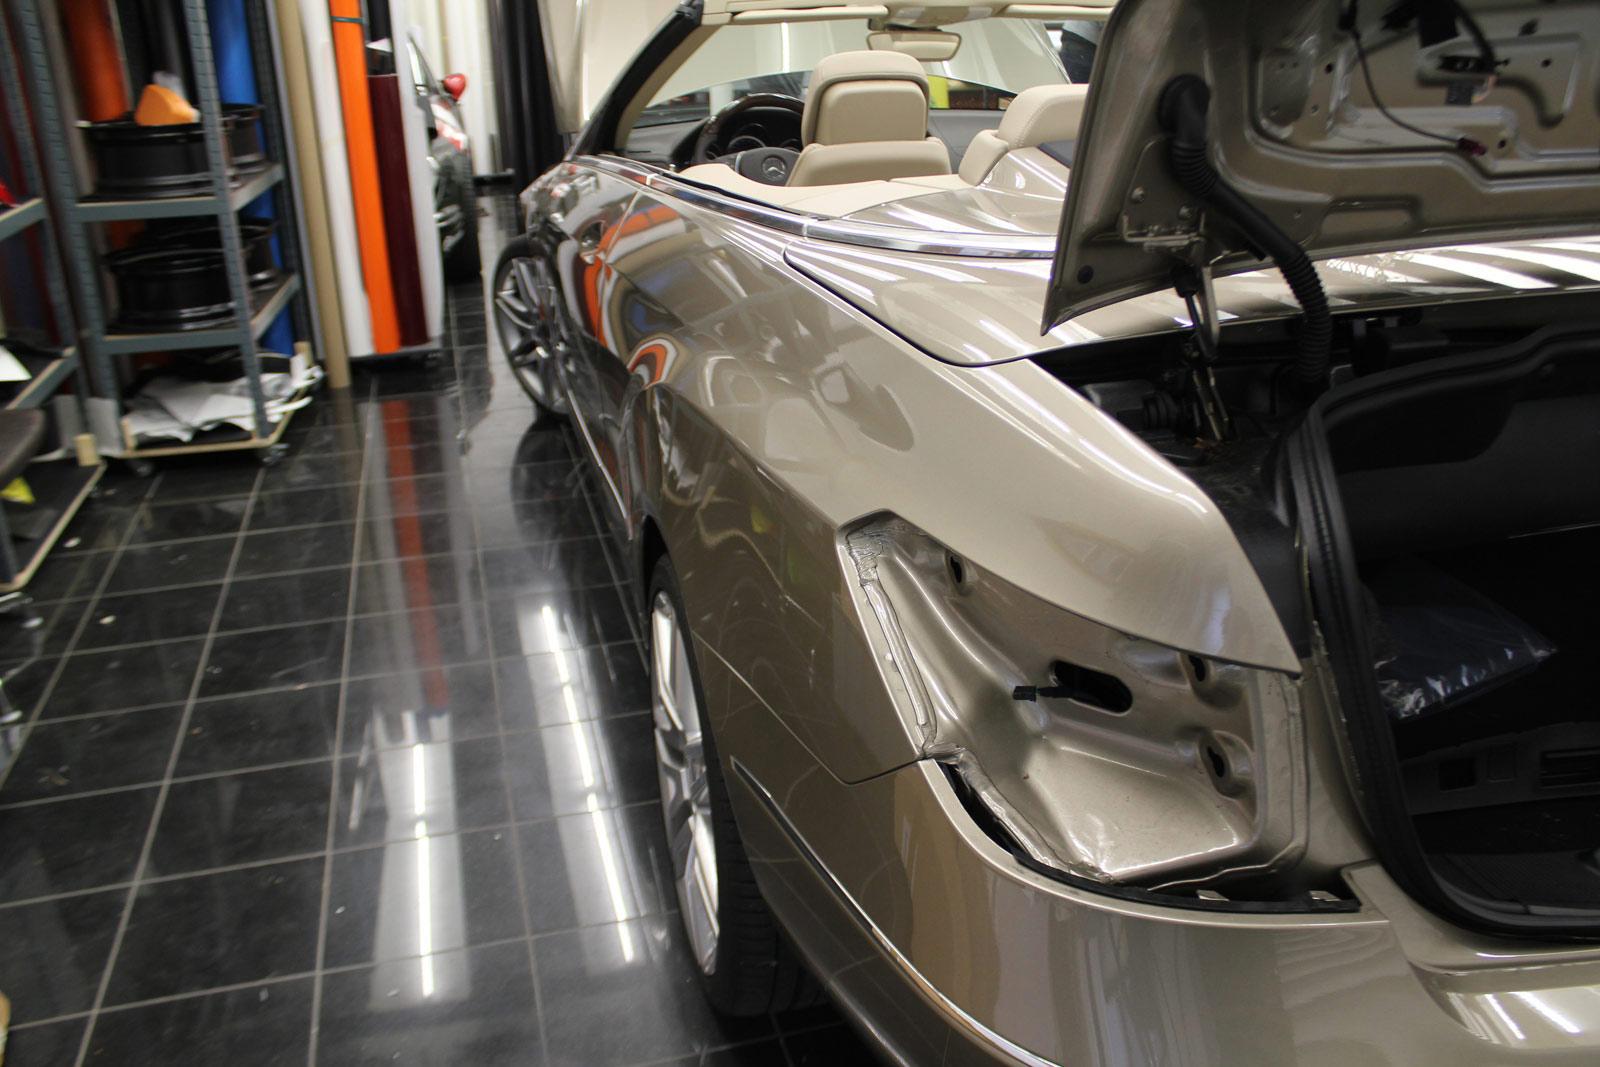 Mercedes_E-Klasse_Cabrio_Folierung_Stannitgrau_Metallic_Glanz_03